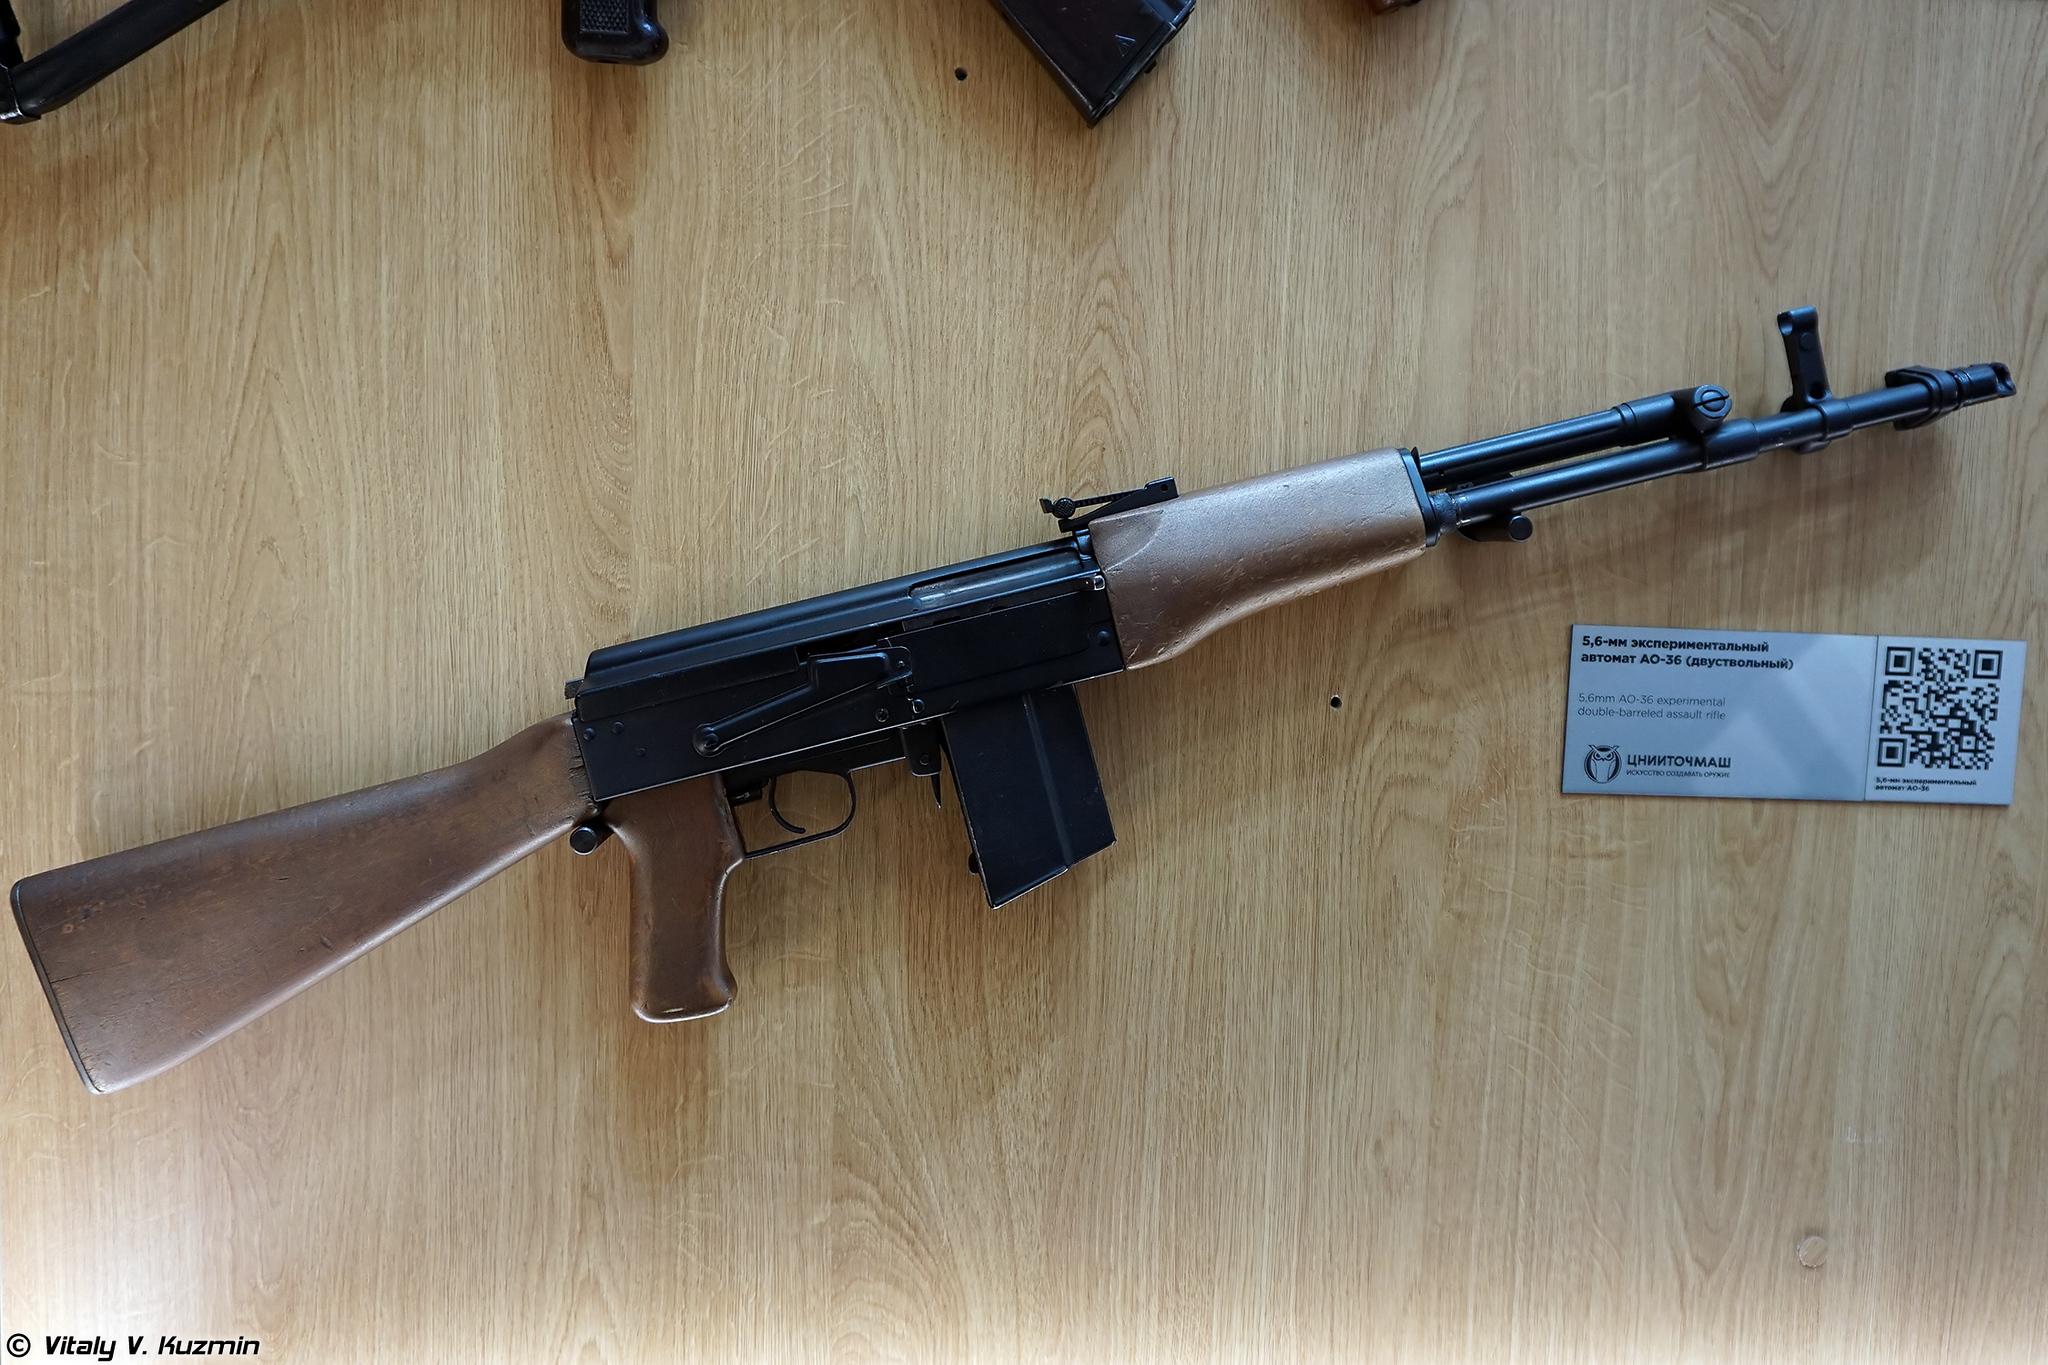 Russian Assault Rifles/Carbines/Machine Guns Thread: #2 - Page 10 Army-2020-Pavilions-047-X4